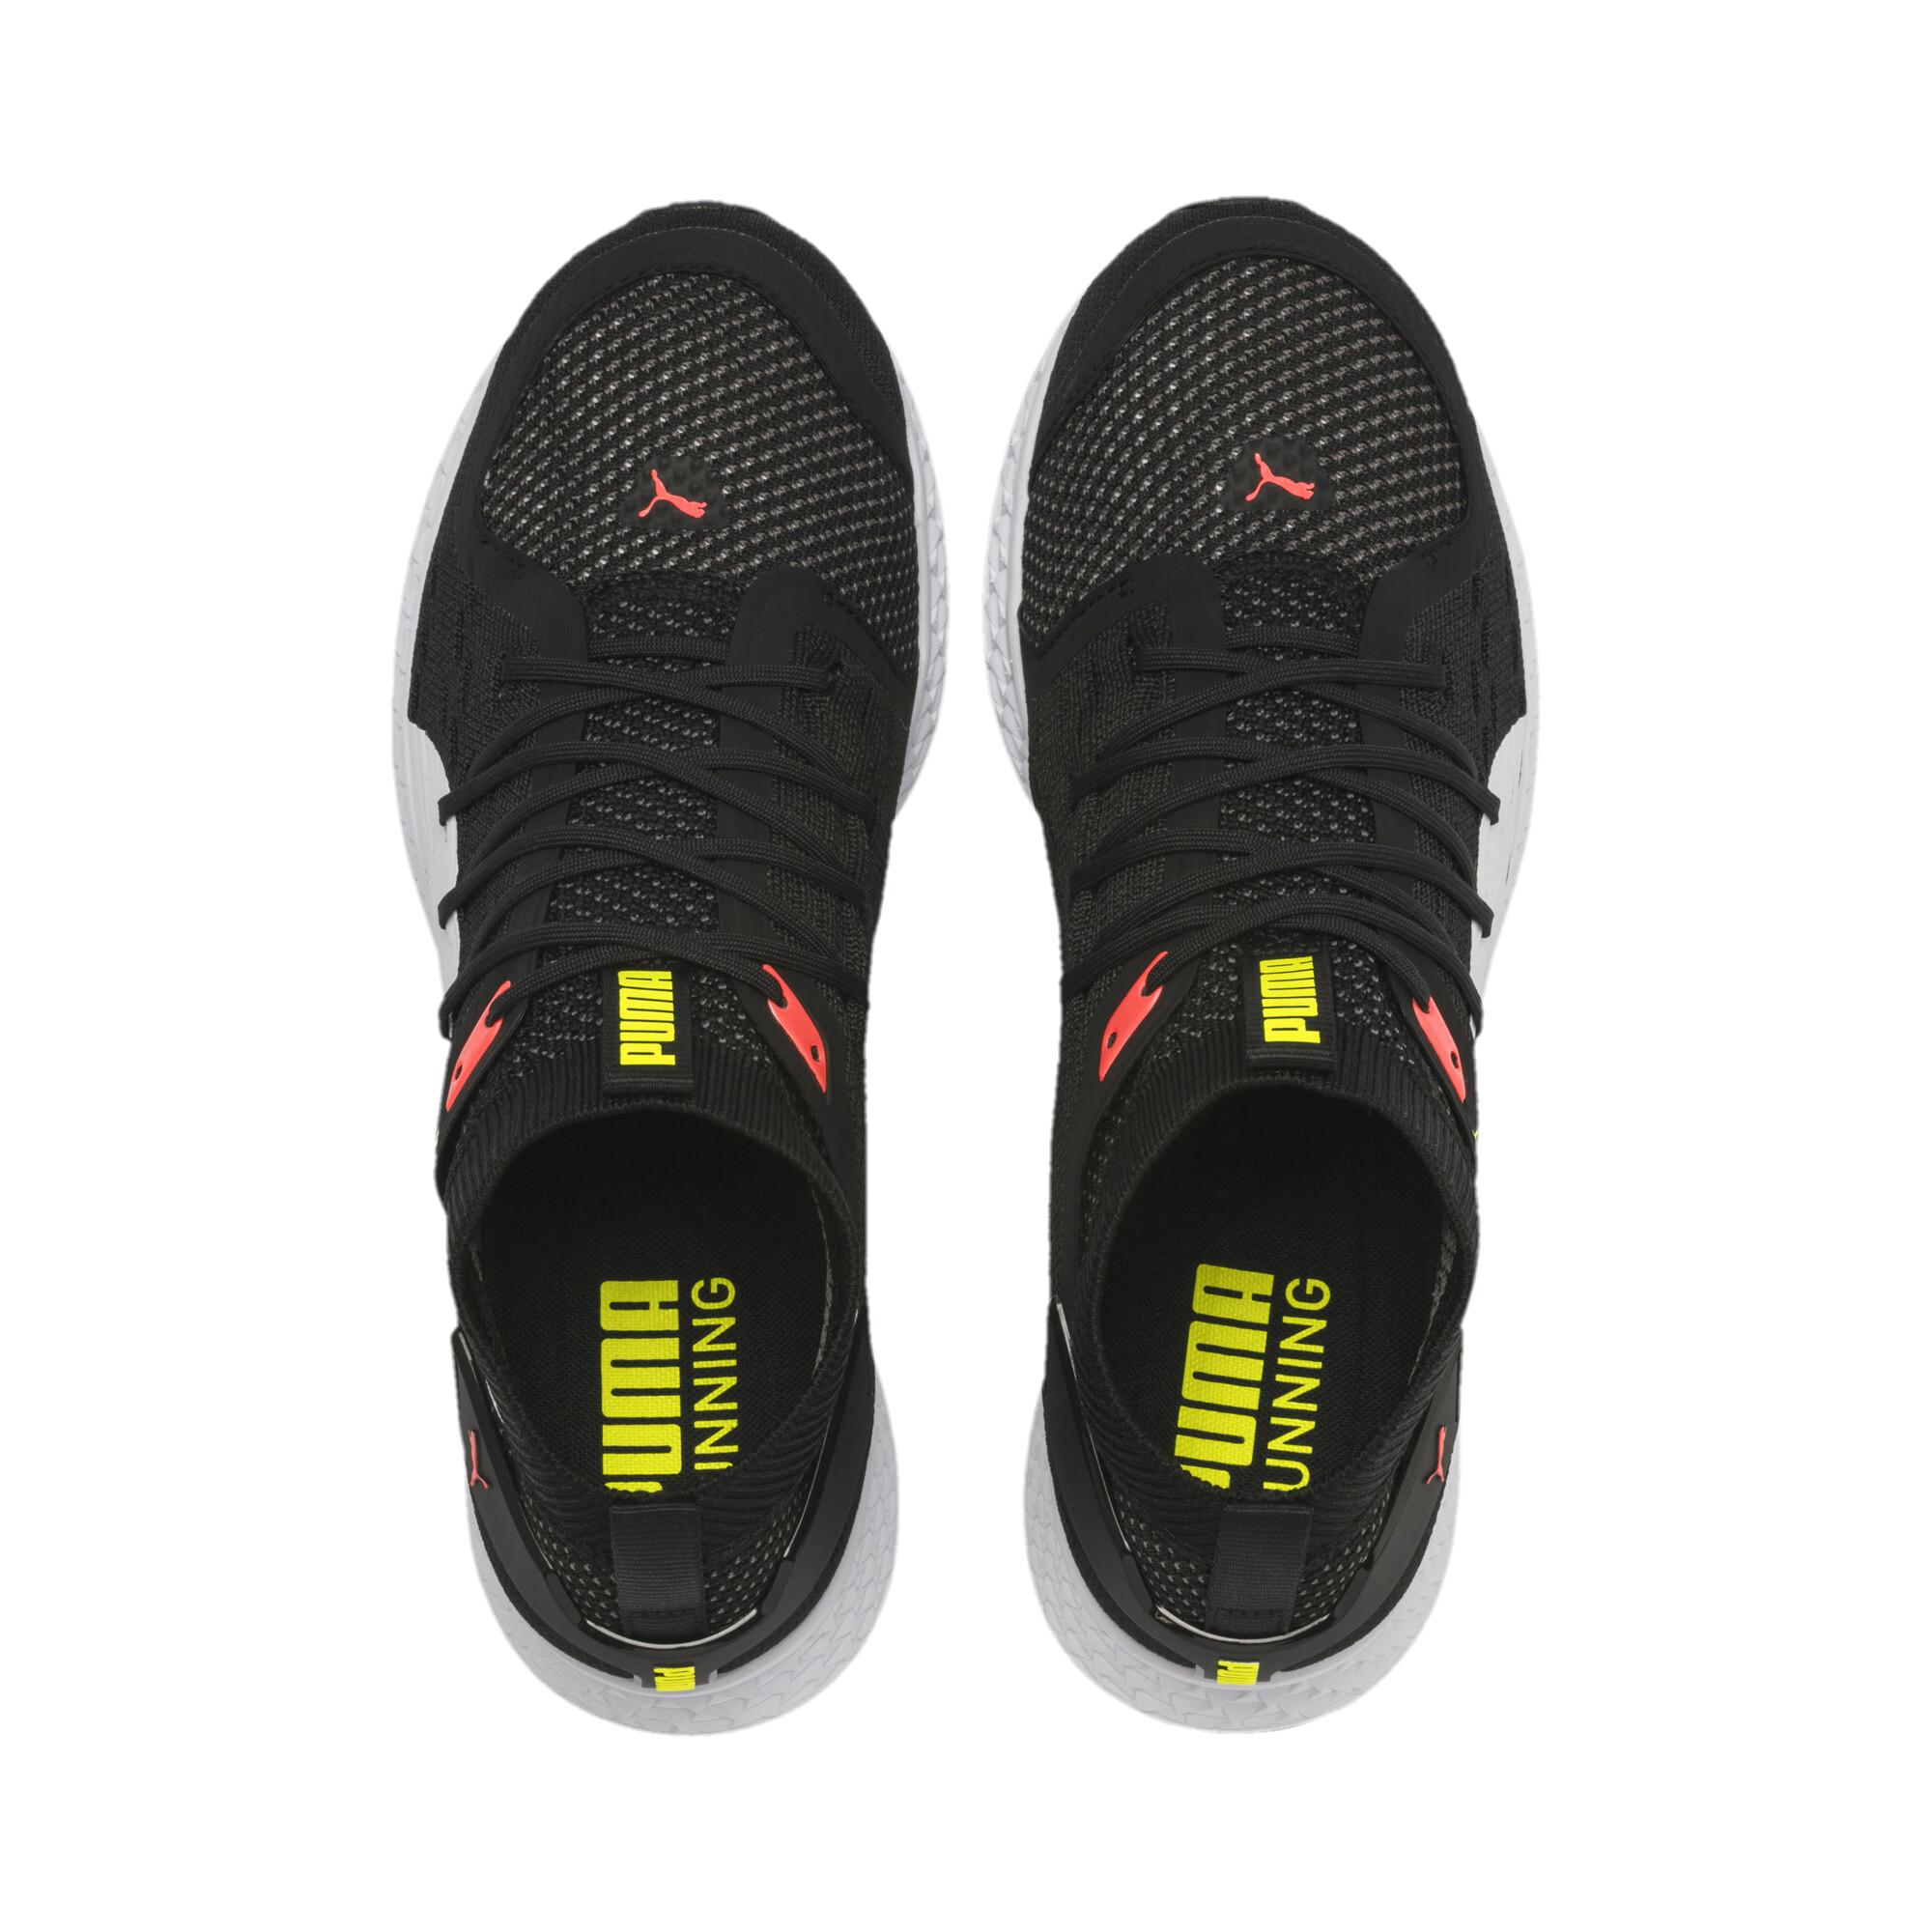 PUMA-SPEED-500-Men-039-s-Running-Shoes-Men-Shoe-Running thumbnail 8